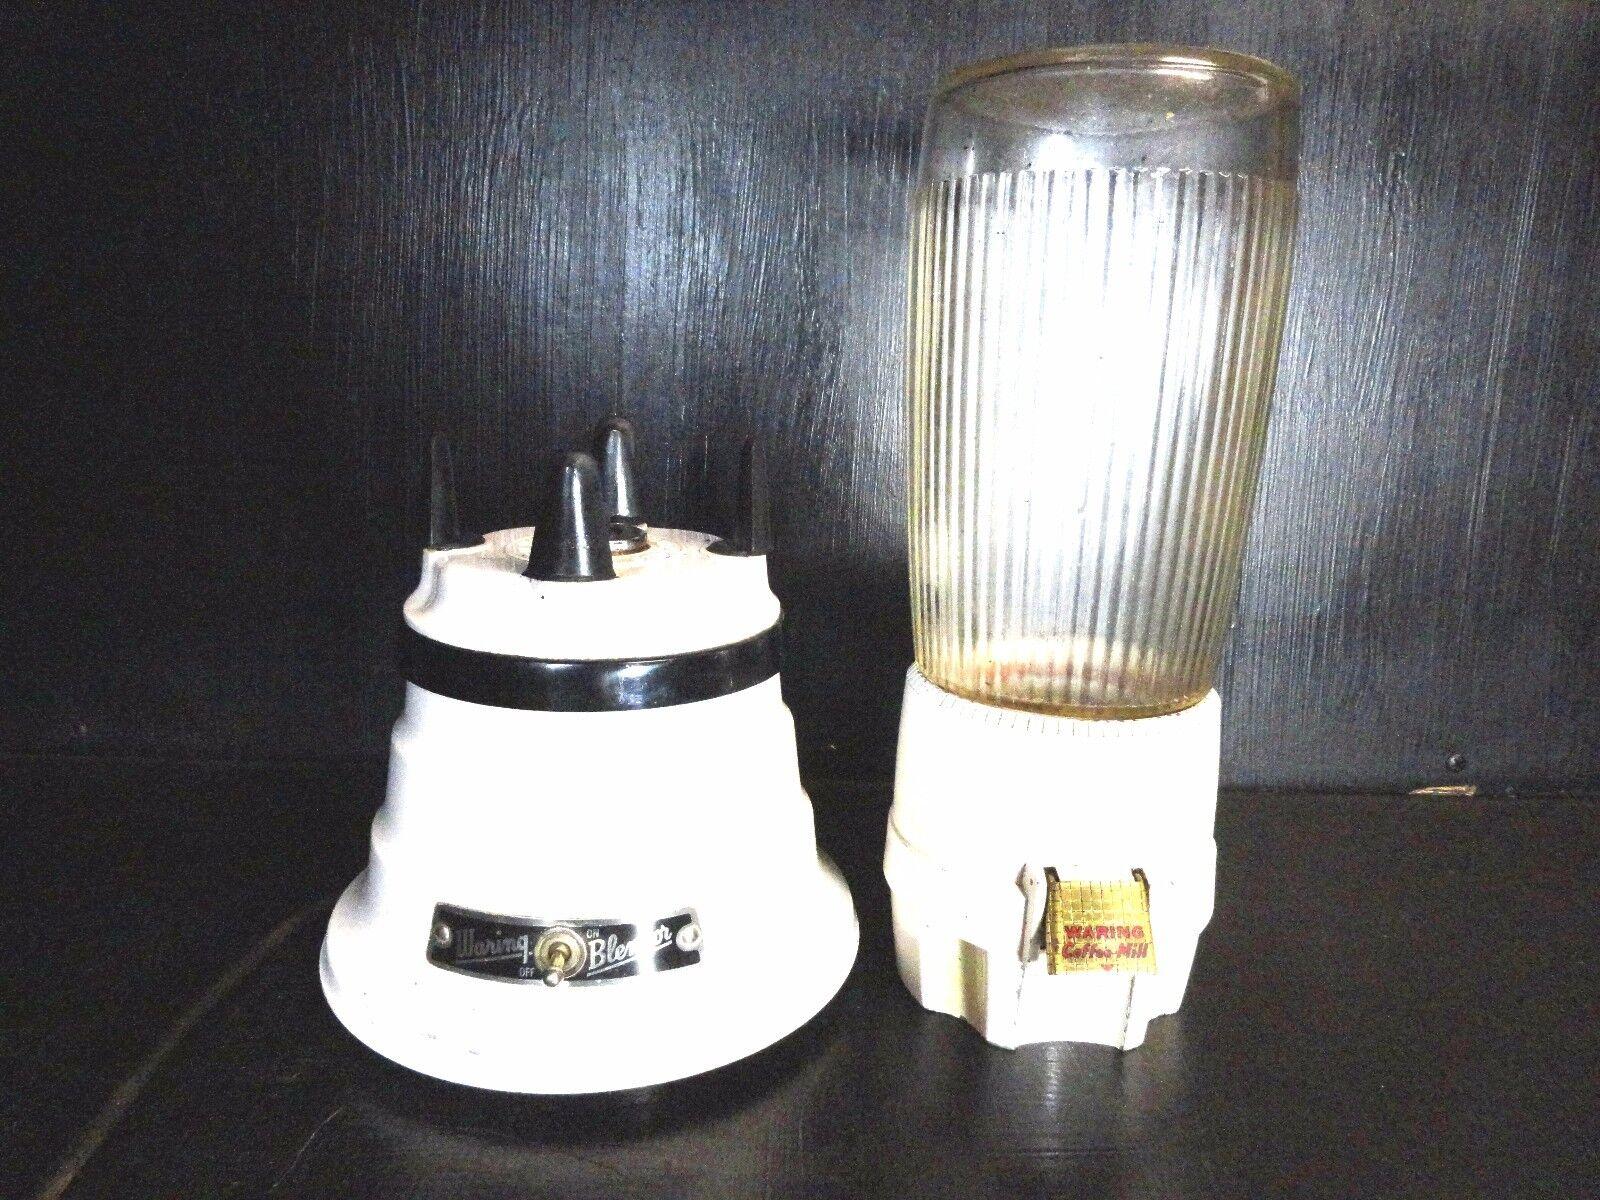 Vintage Waring Blender COFFEE MILL GRINDER BA-2 GLASS AND METAL Model 700B